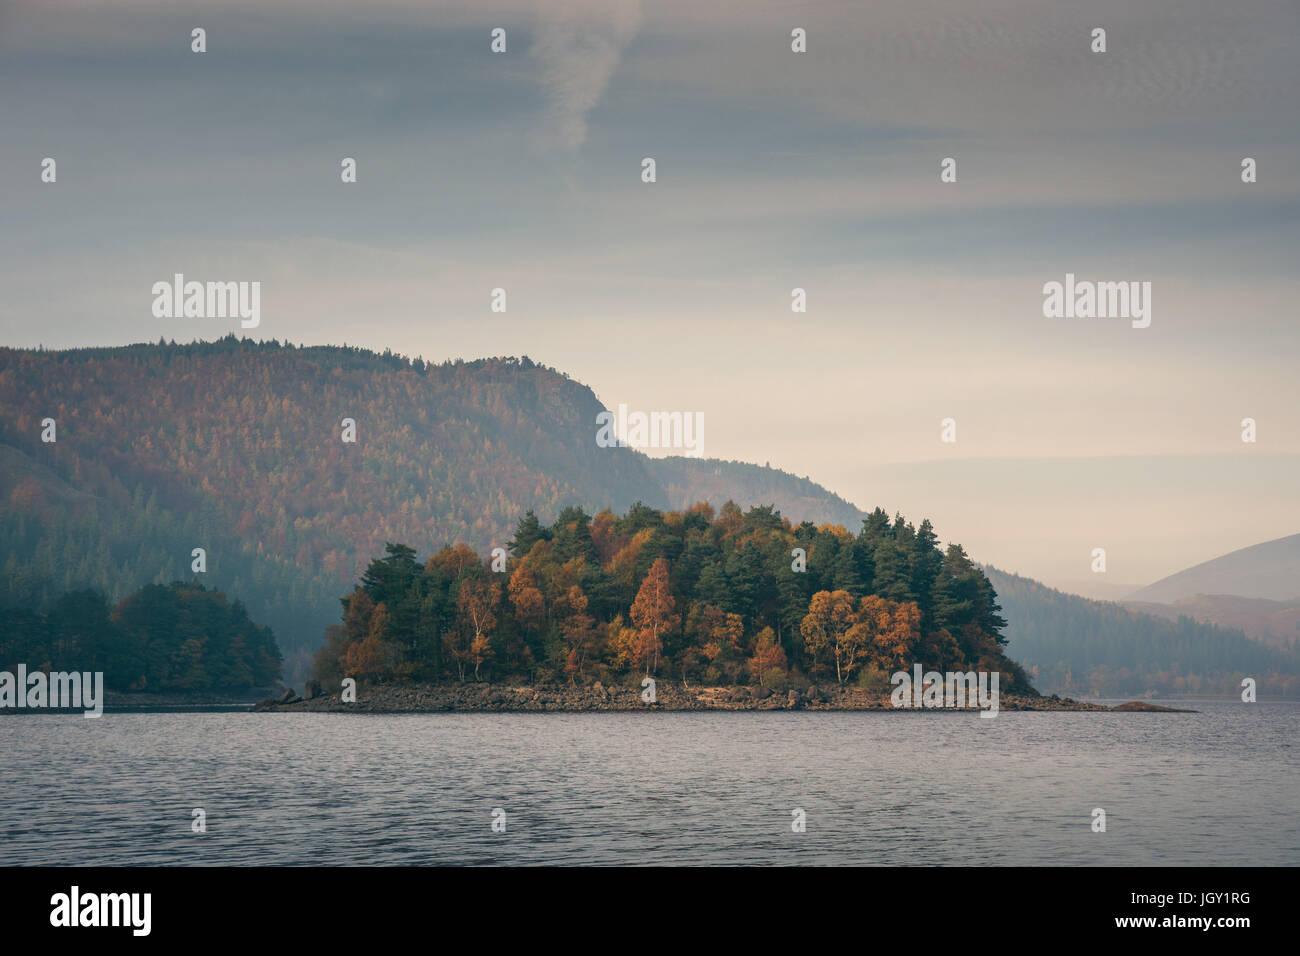 Avis de Thirlmere lake, Lake District, UK Photo Stock